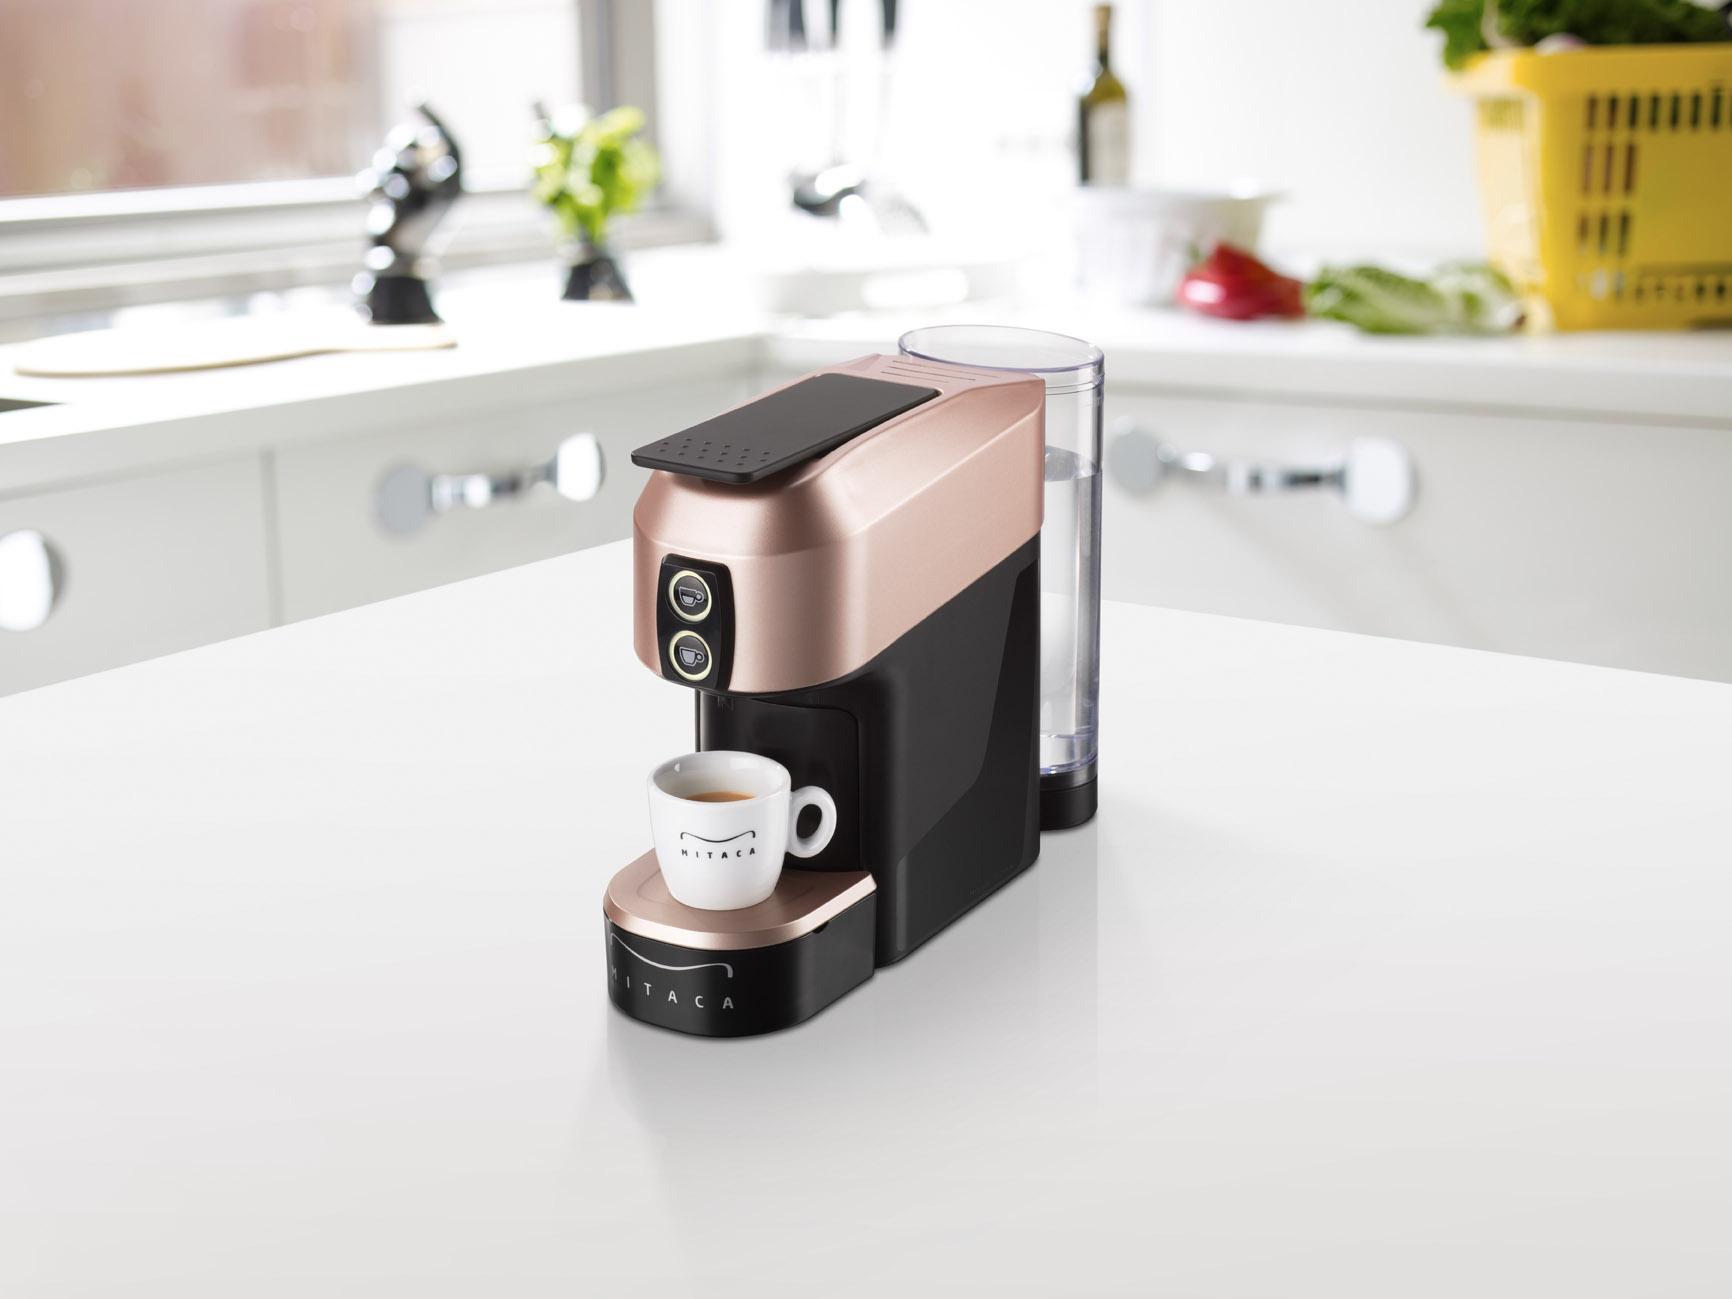 M1 MITACA COFFEE CUP